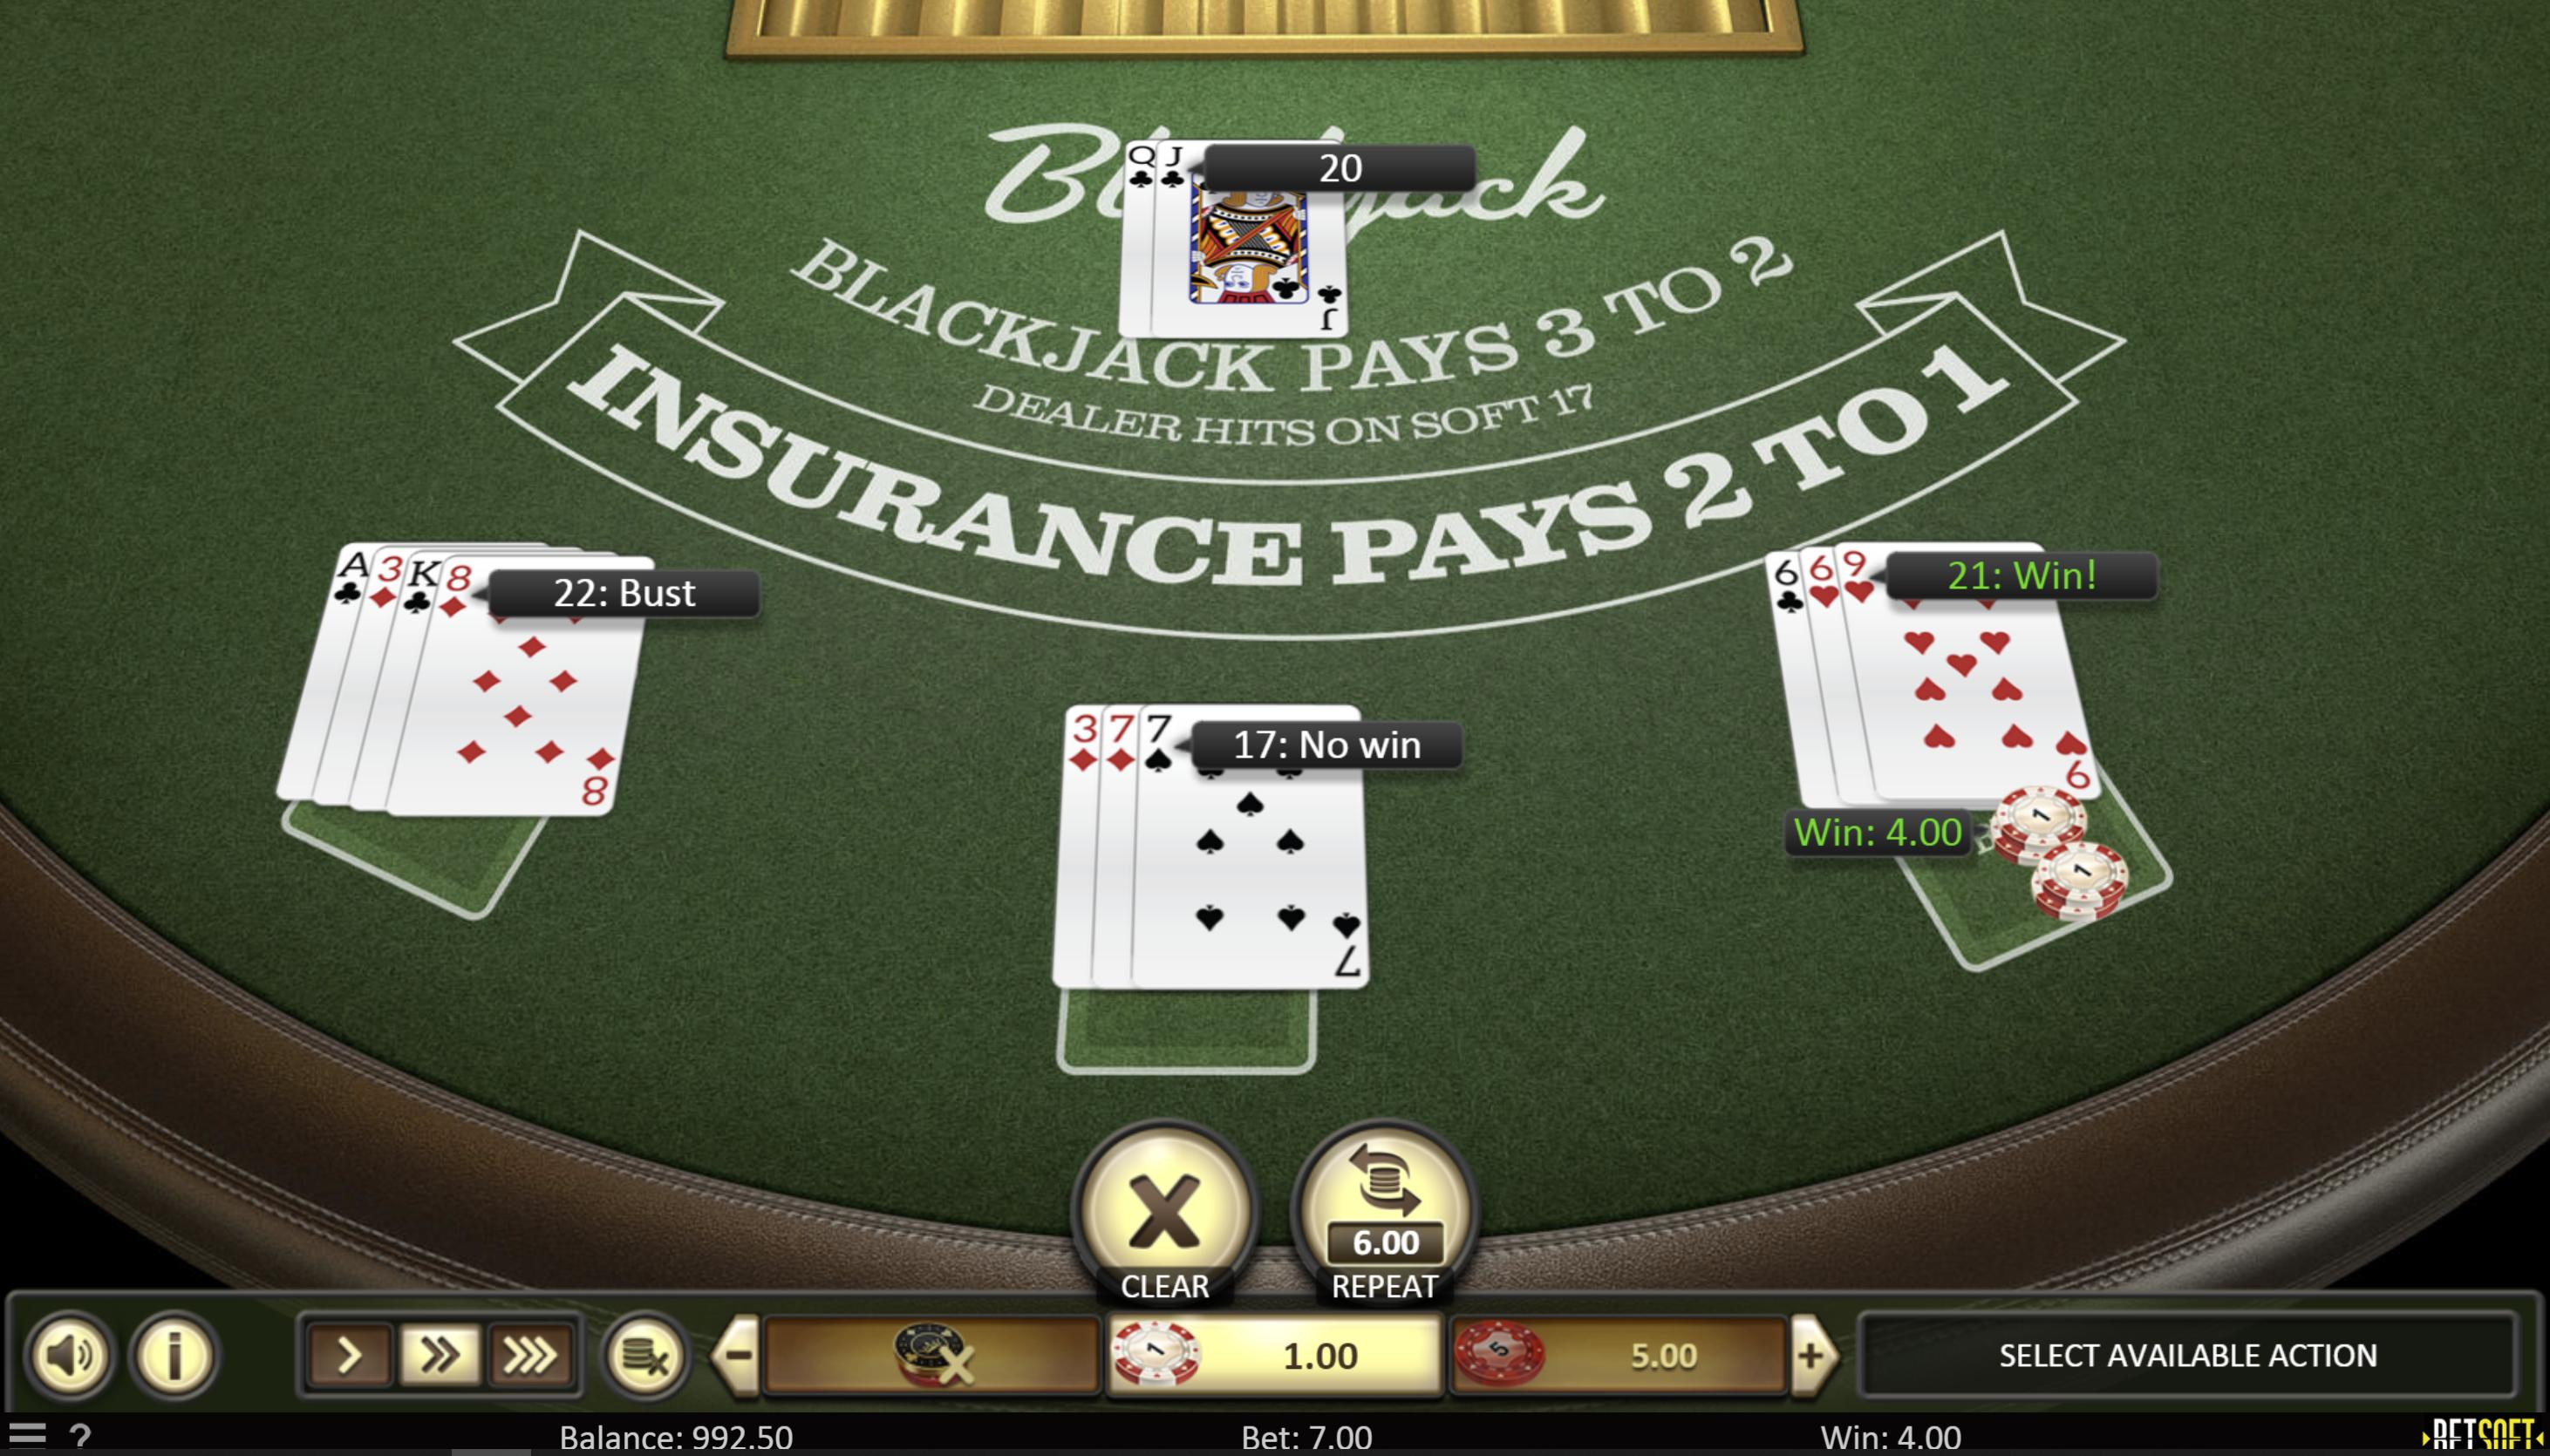 Blackjack Online Casinos